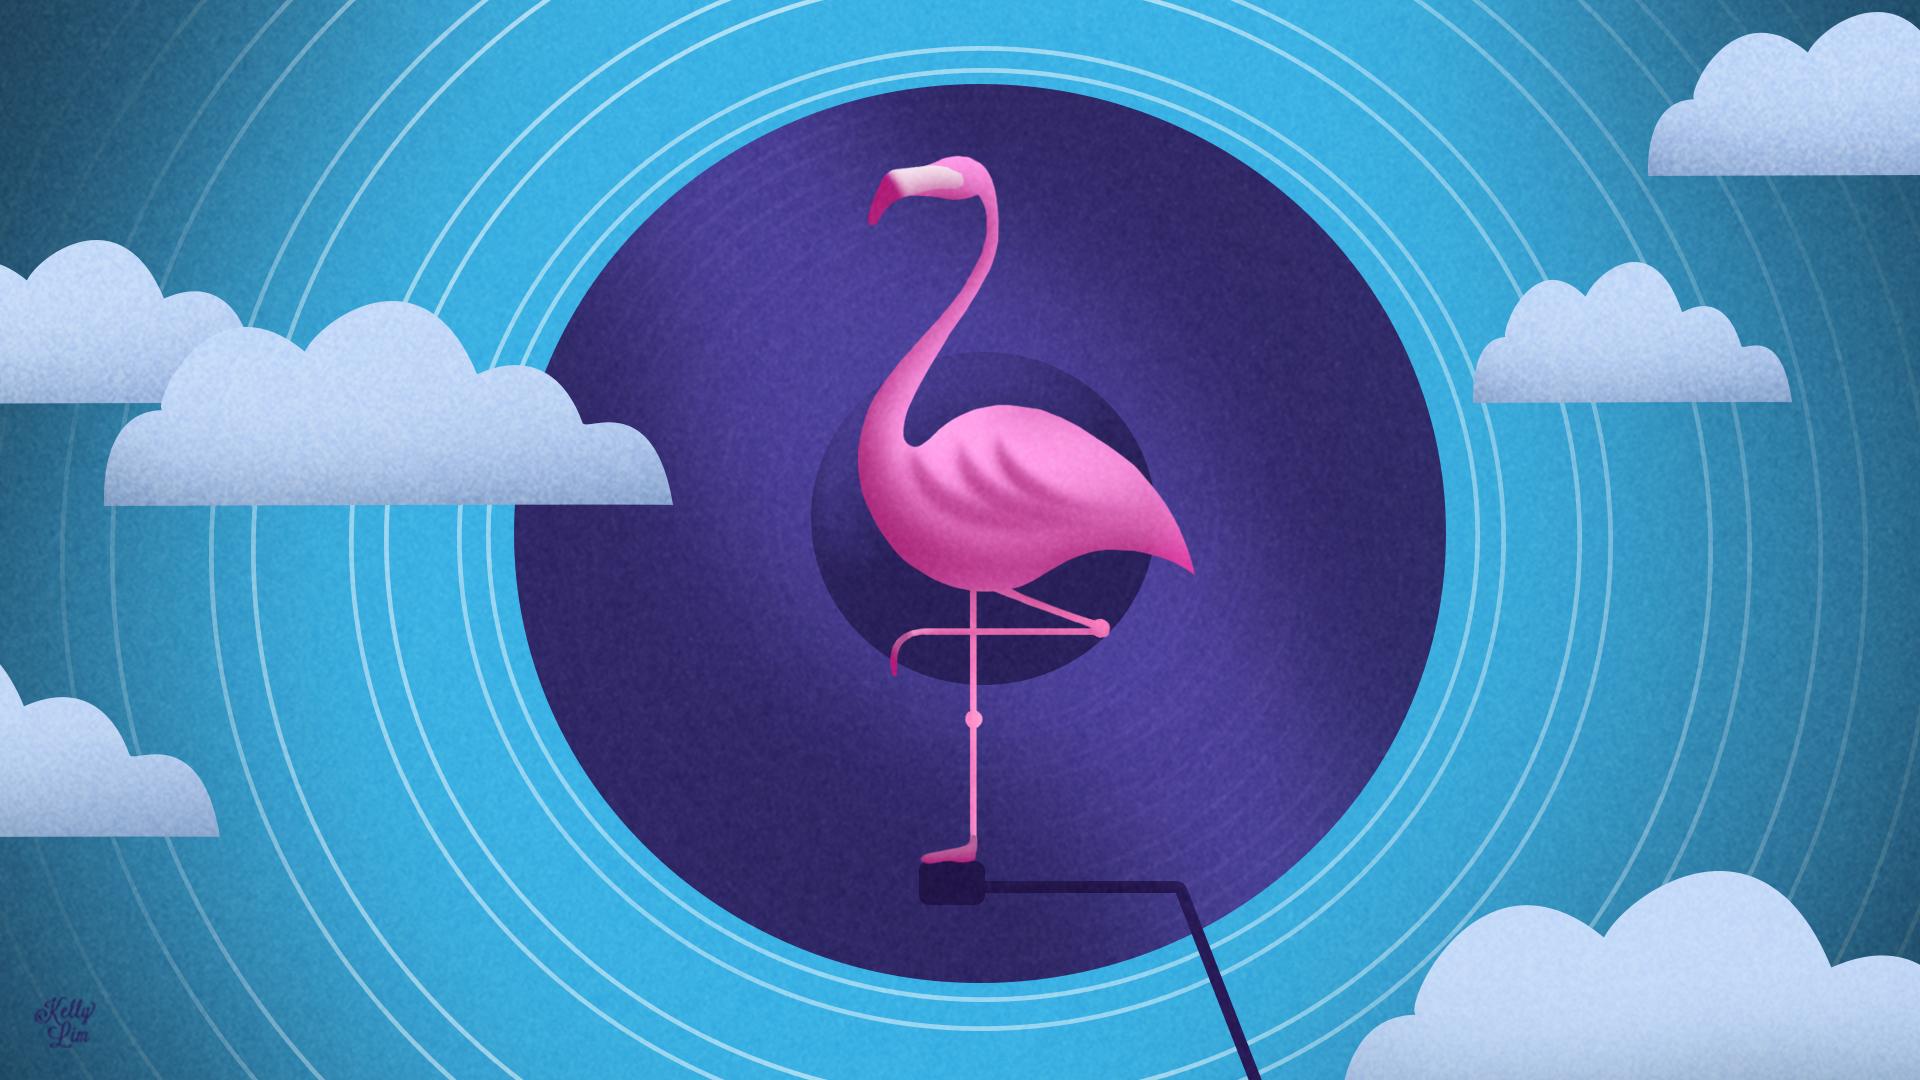 Flamingos_v06.jpg